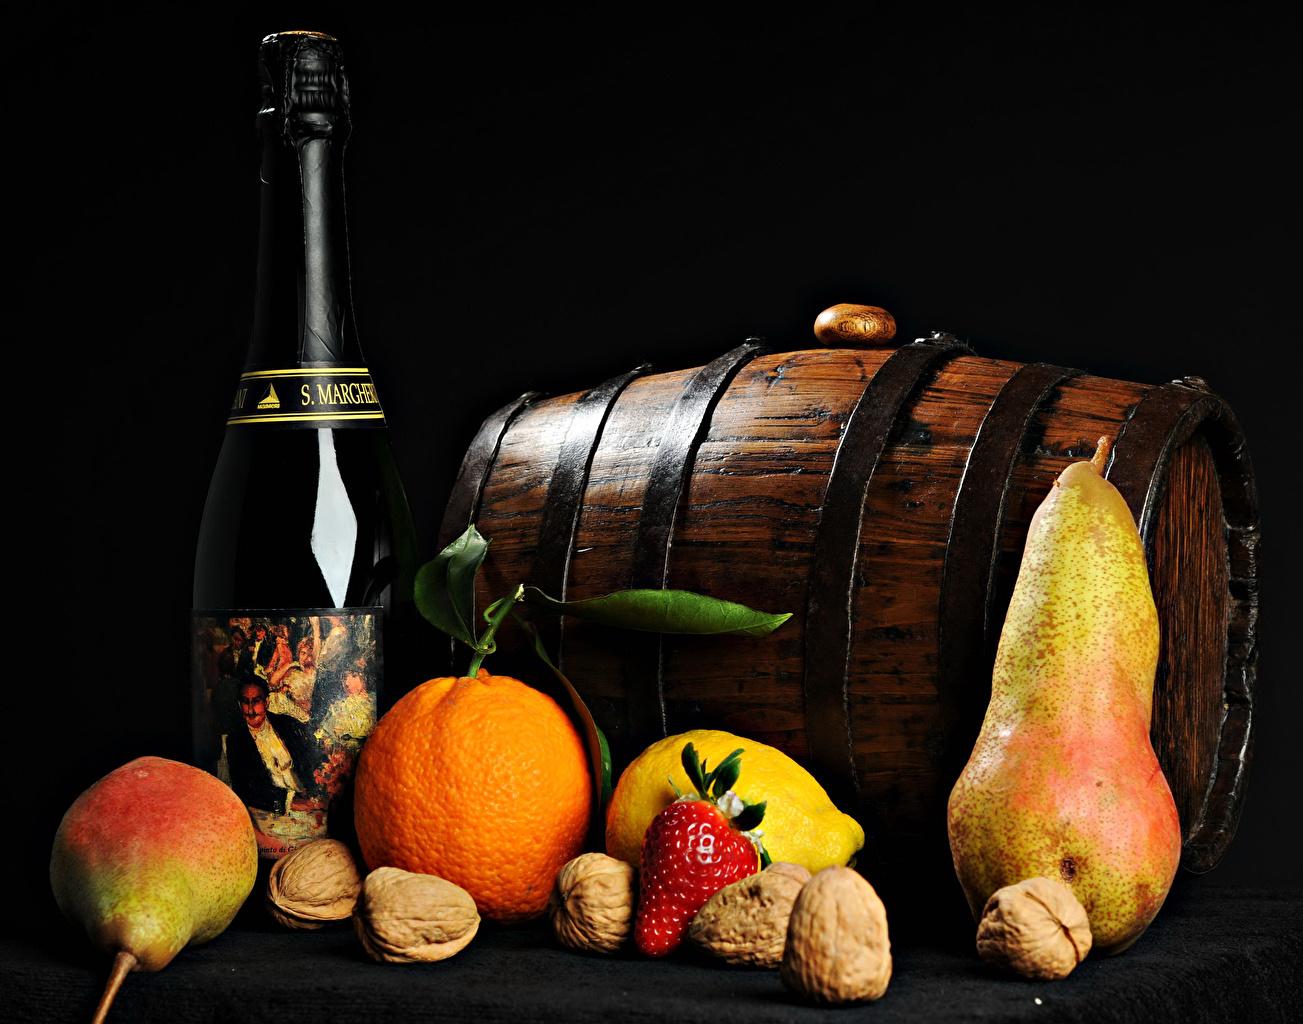 Desktop Wallpapers Wine Orange fruit cask Pears Food Fruit Bottle Nuts Black background Barrel bottles